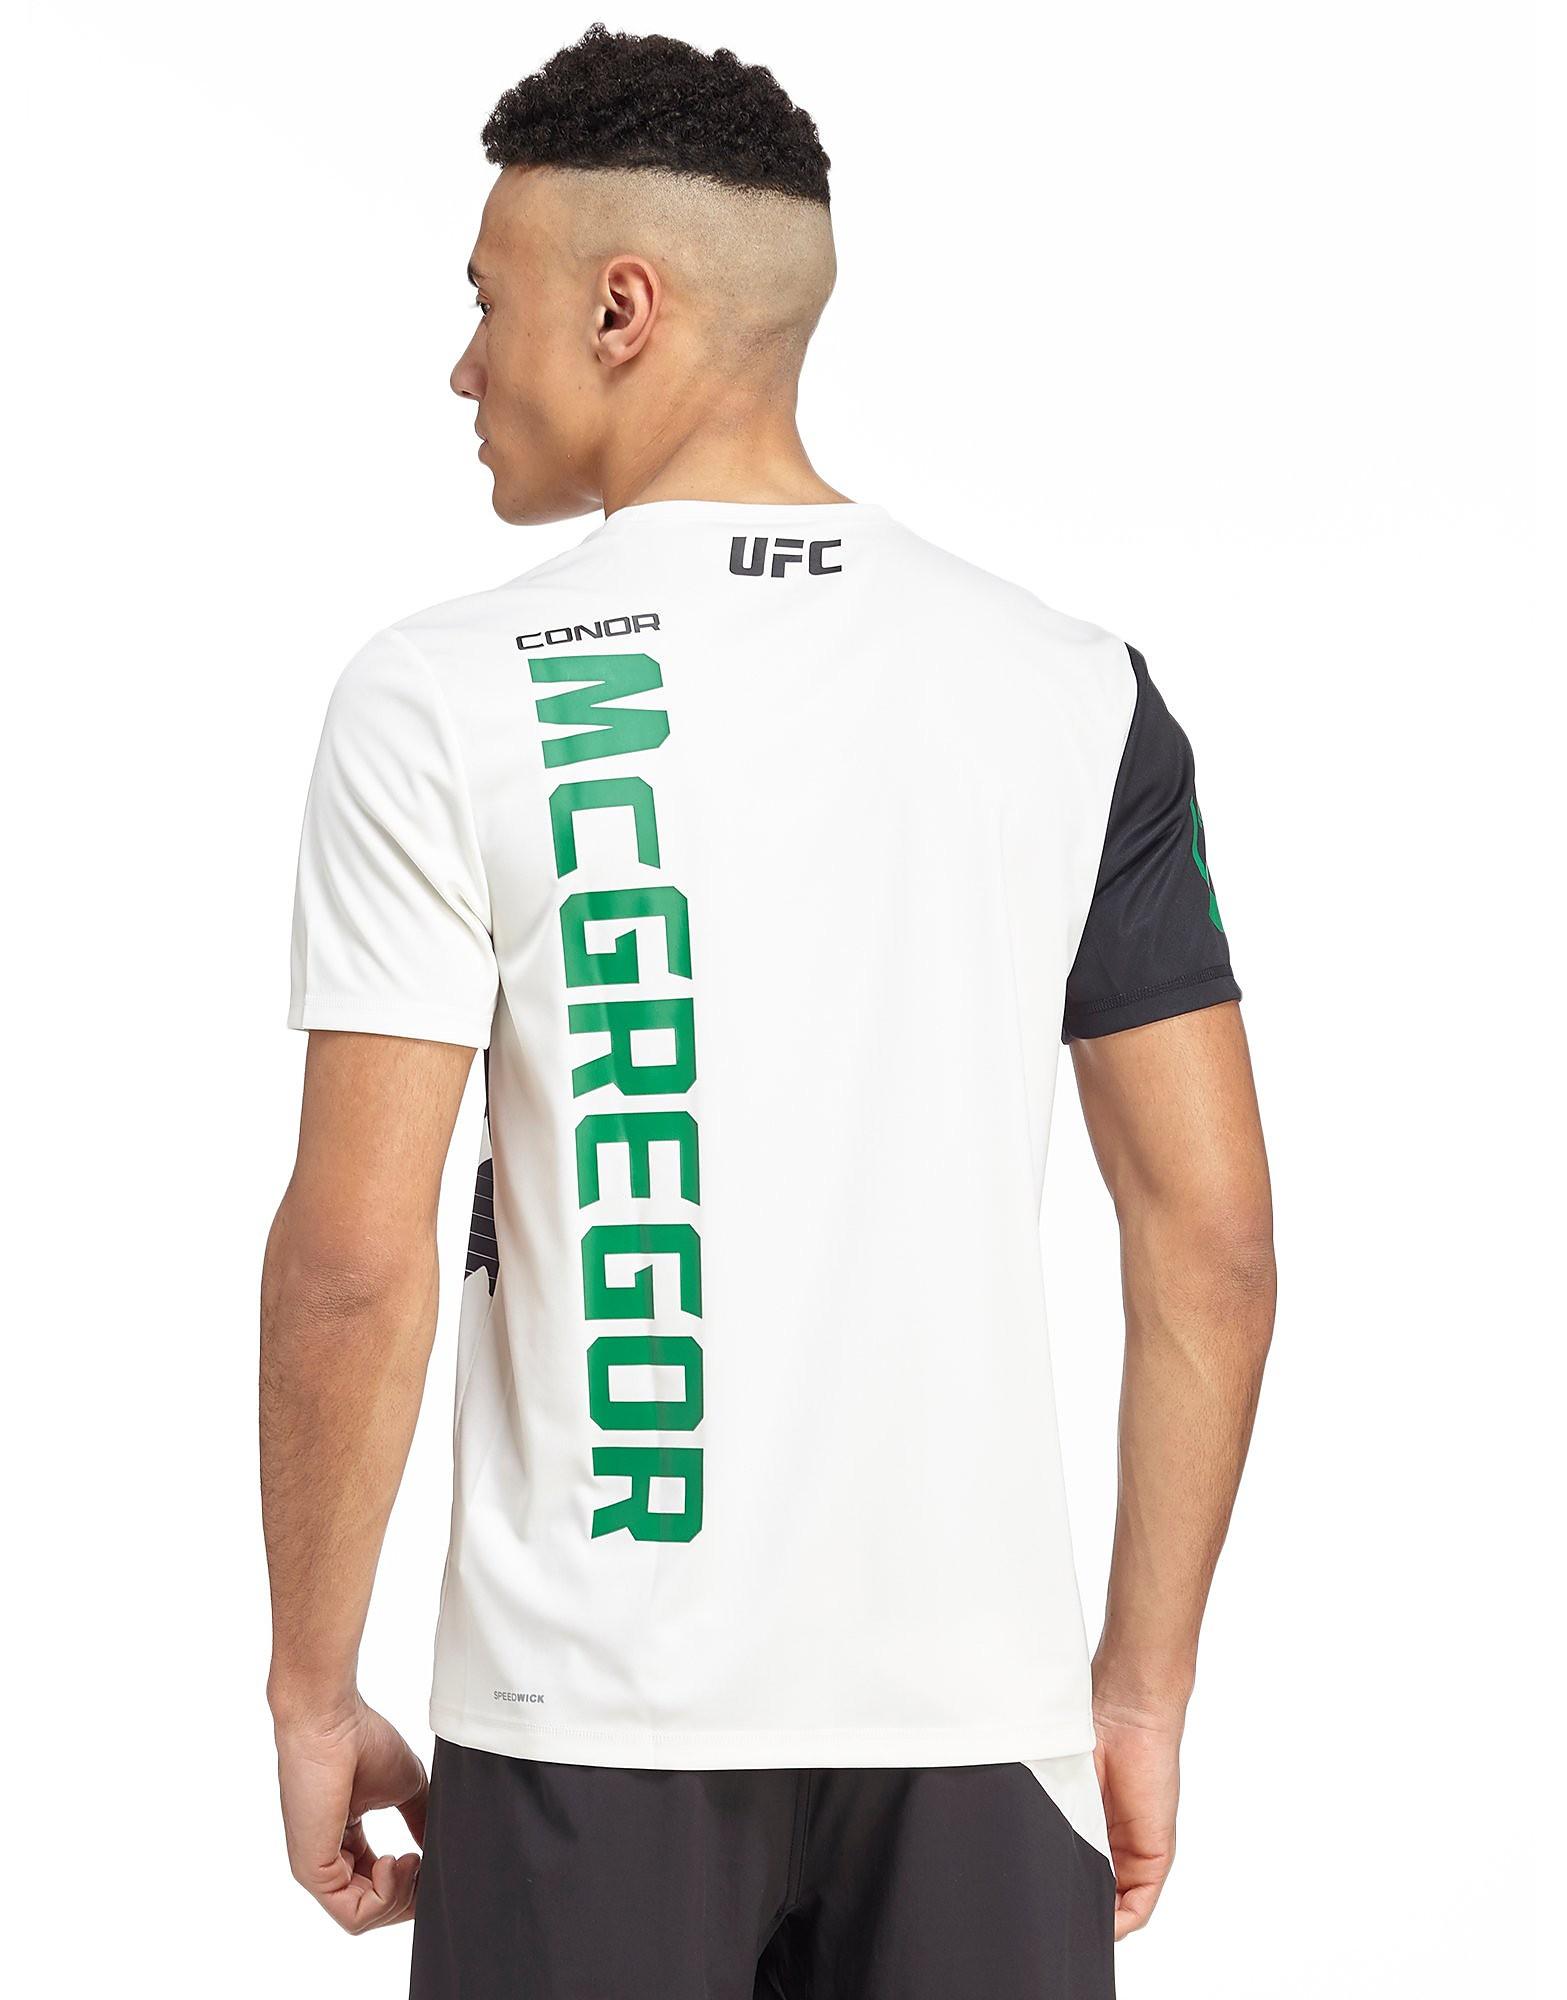 Reebok UFC Conor McGregor Jersey